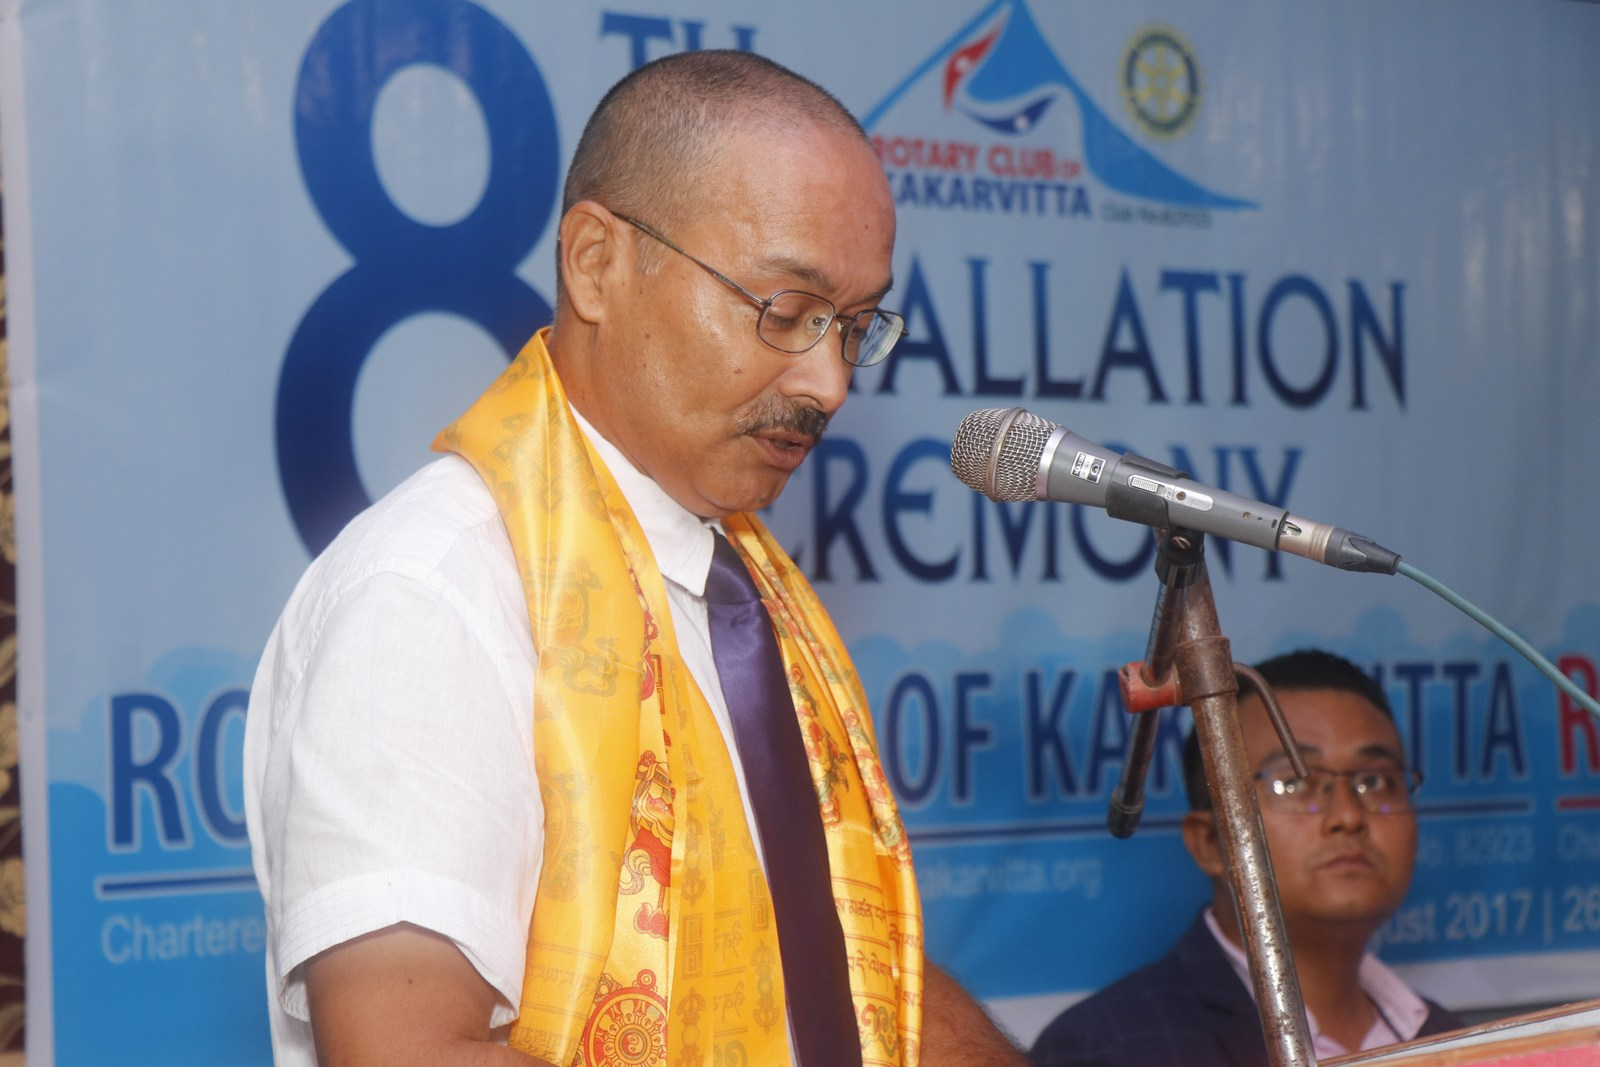 8th-Installation-Ceremony-Rotary-Club-of-Kakarvitta-83